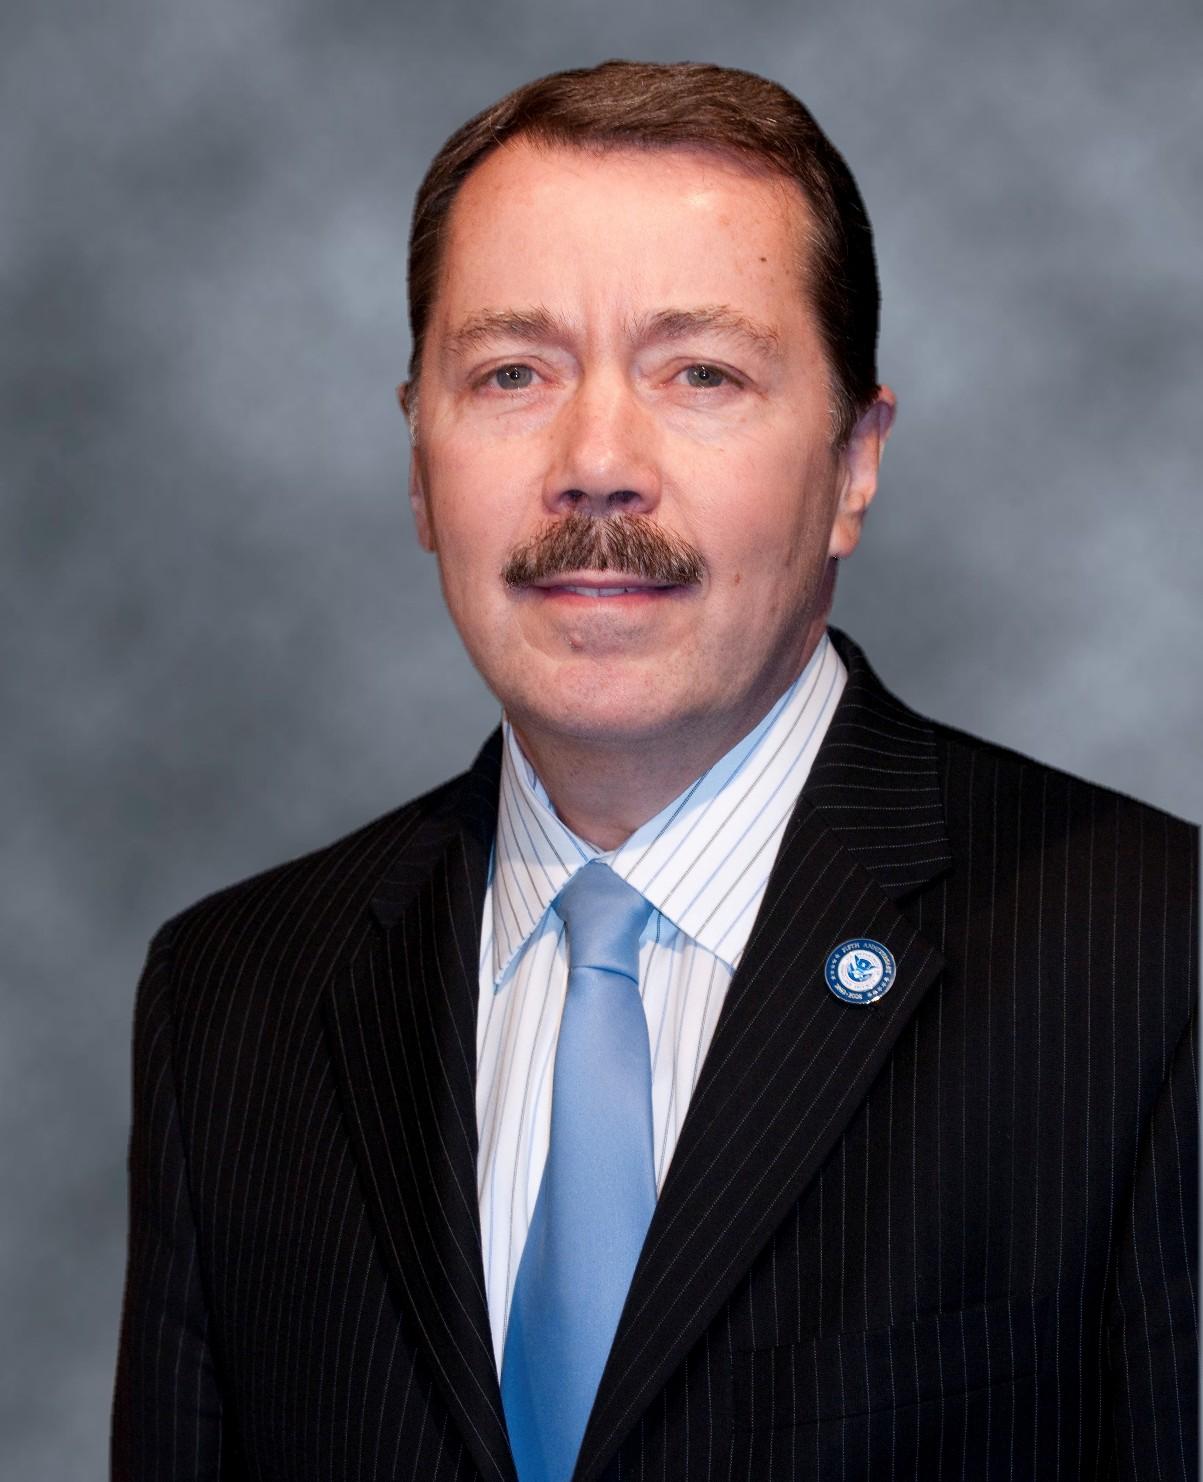 Reducing Violence >> William Flynn Joins Cardinal Point Strategies as Senior Strategic Advisor